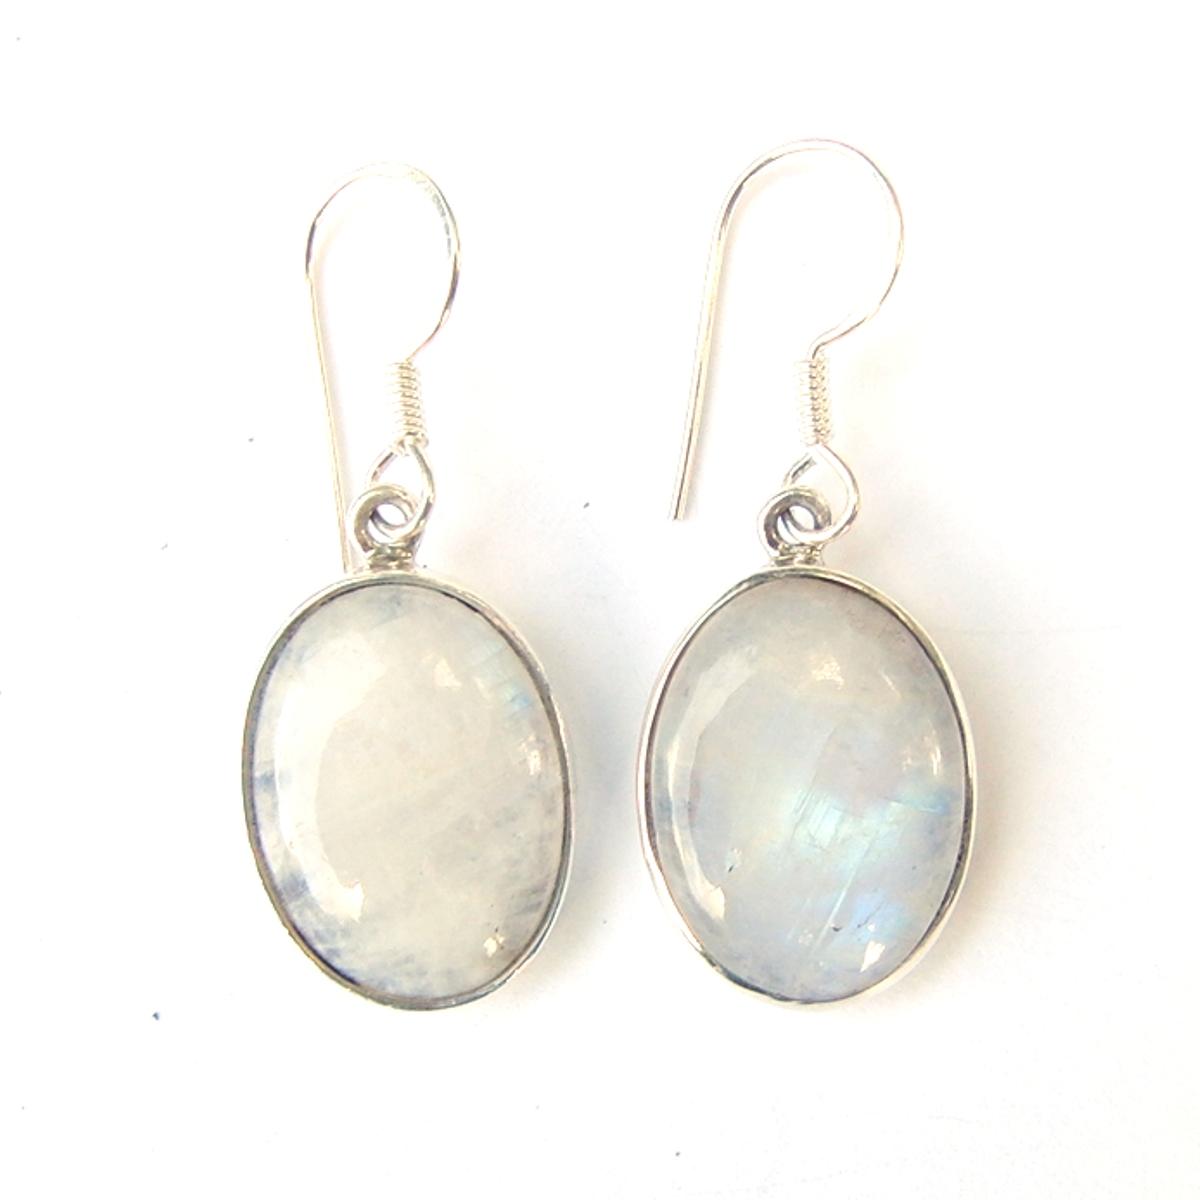 Moonstone Large Cab Earrings